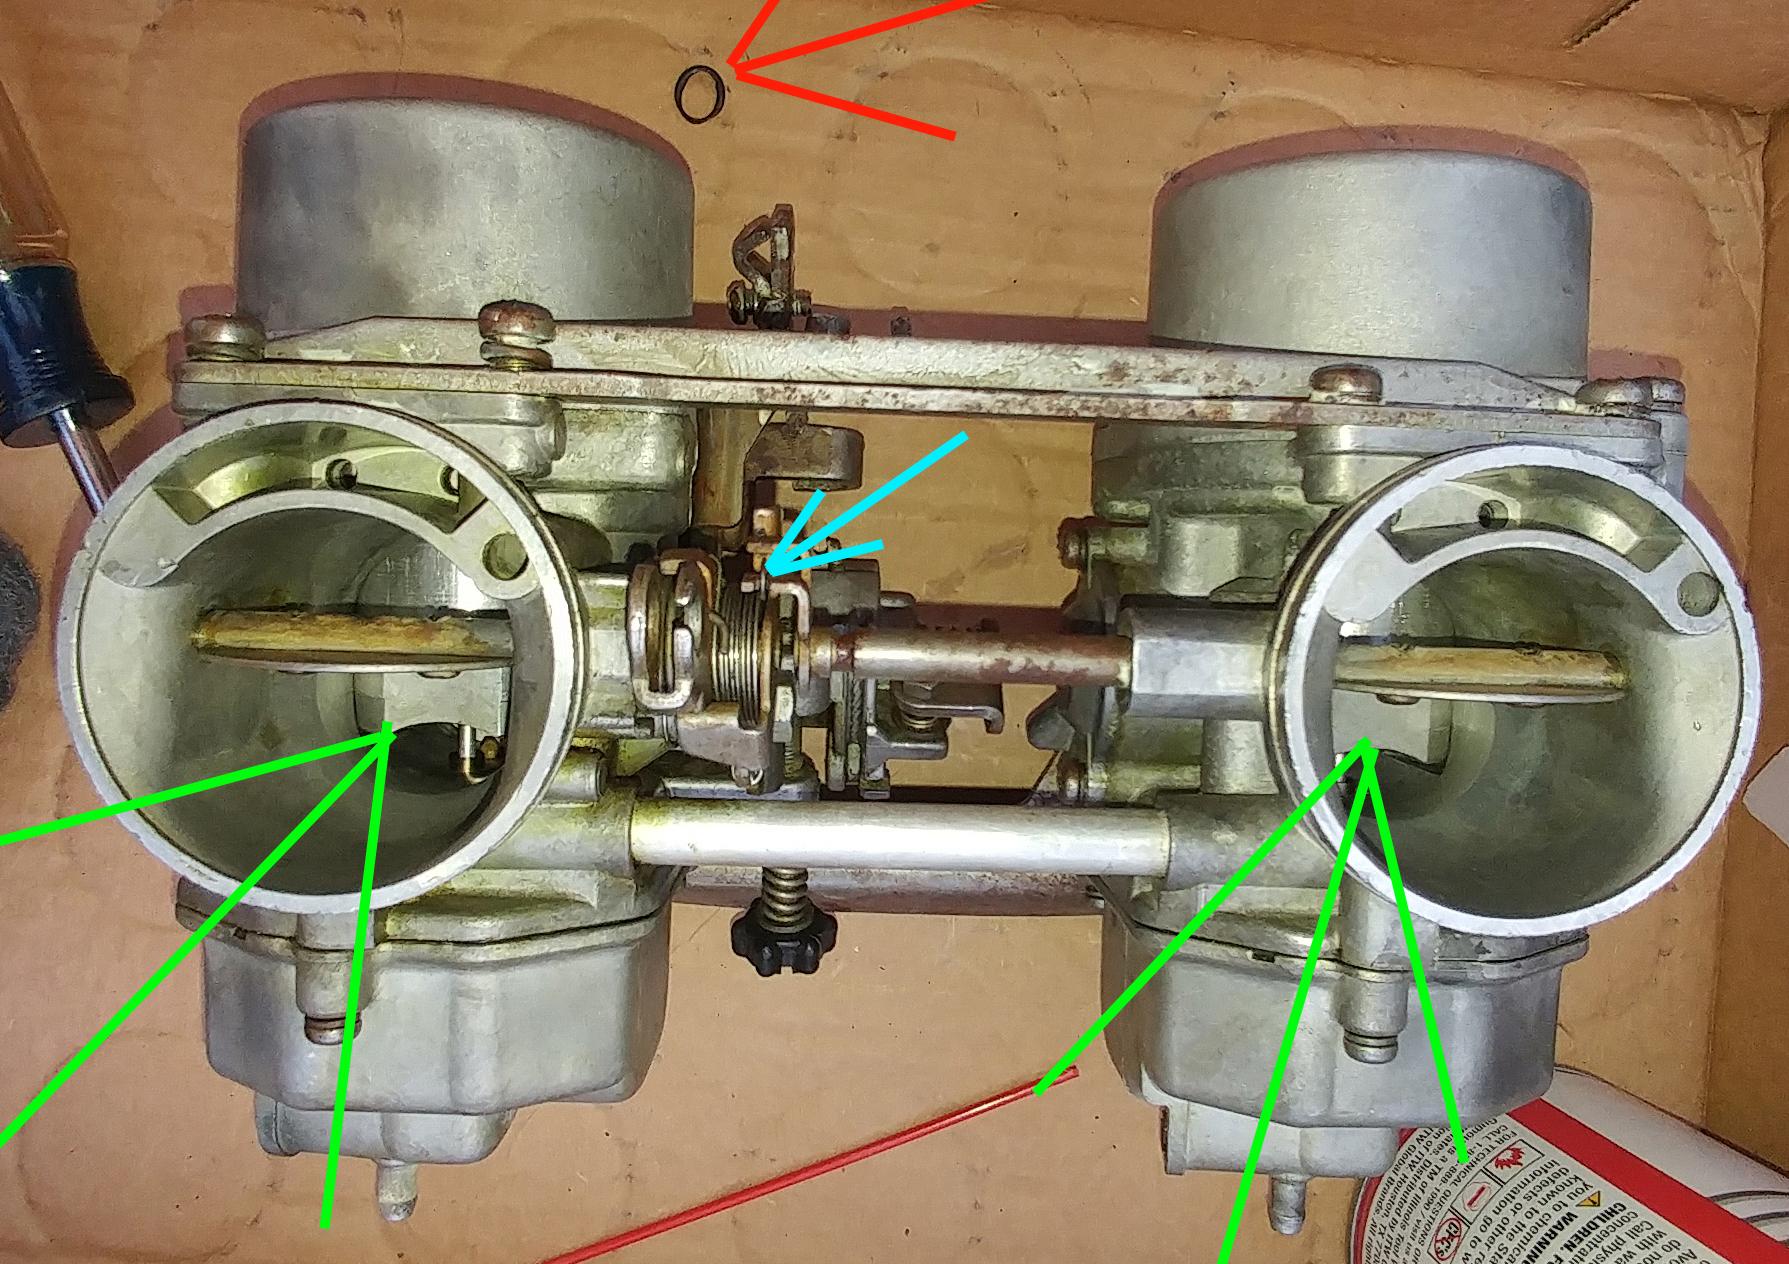 Does anyone know the tuning specs for a Keihin carb VB 21B-1978-honda-hawk-ii-cb400-carb-8-copy.jpg